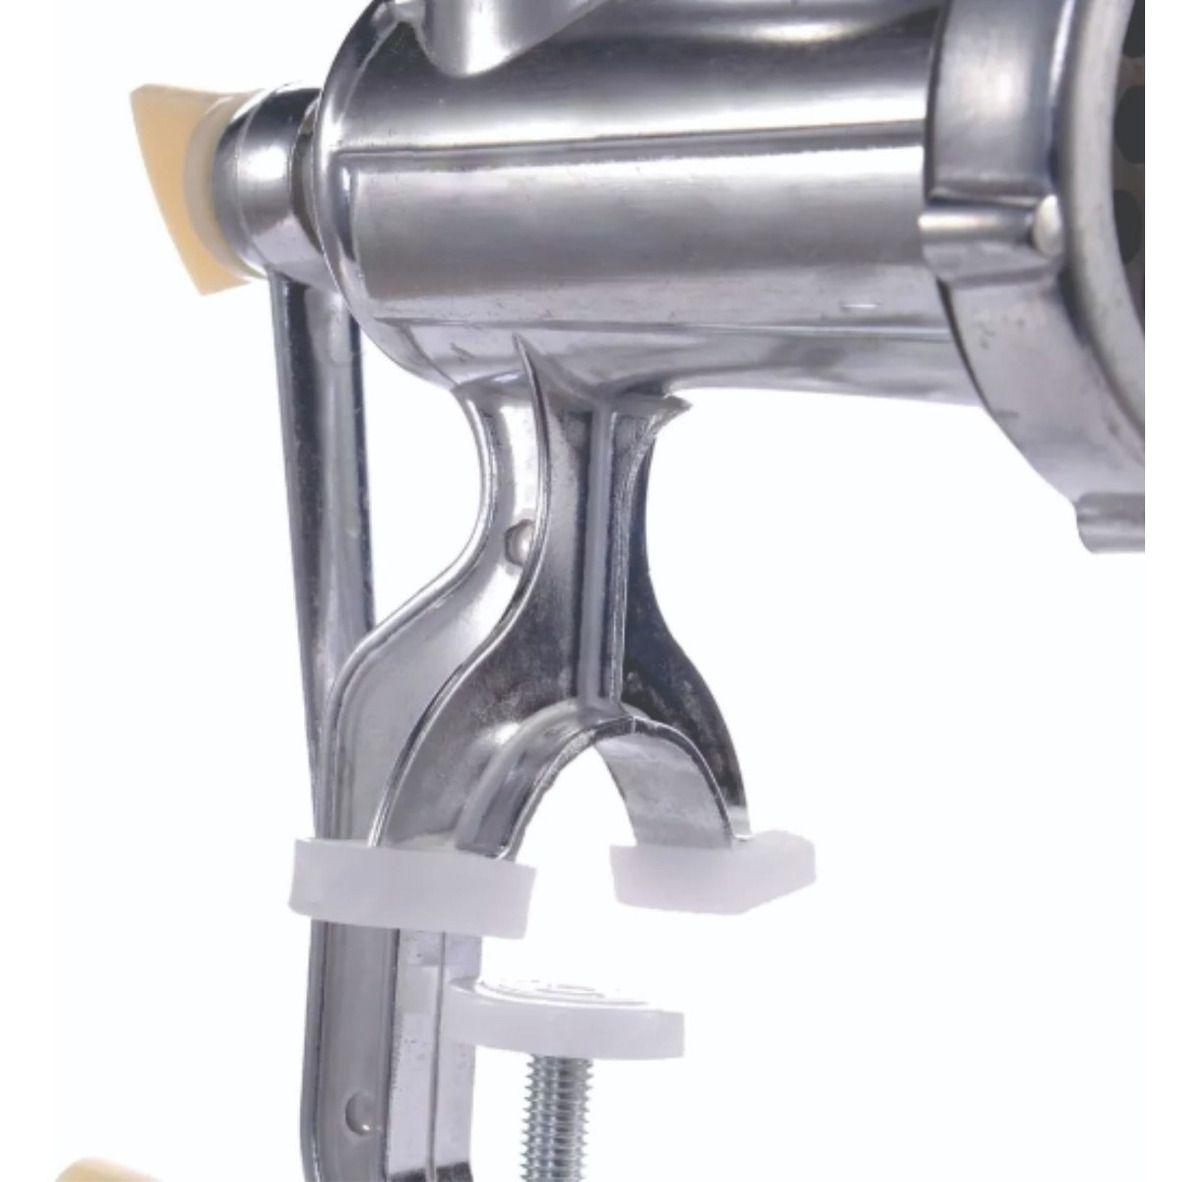 Moedor De Carne Manual Profissional Maquina Alumínio Num 10